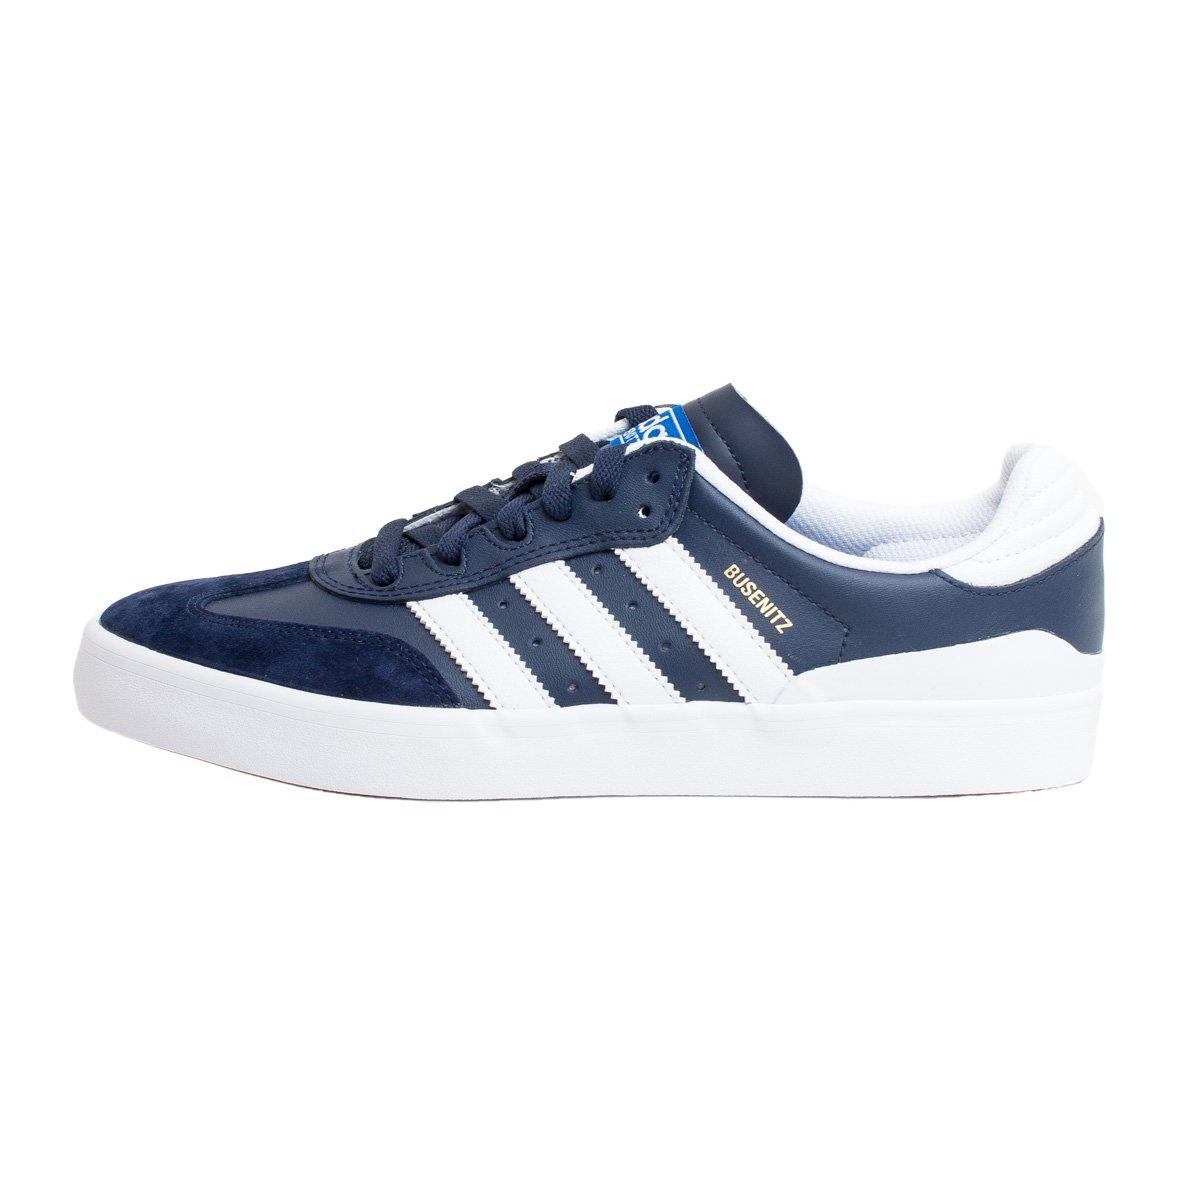 Adidas Herren Busenitz Vulc Rx Skaterschuhe, 40,5 EU